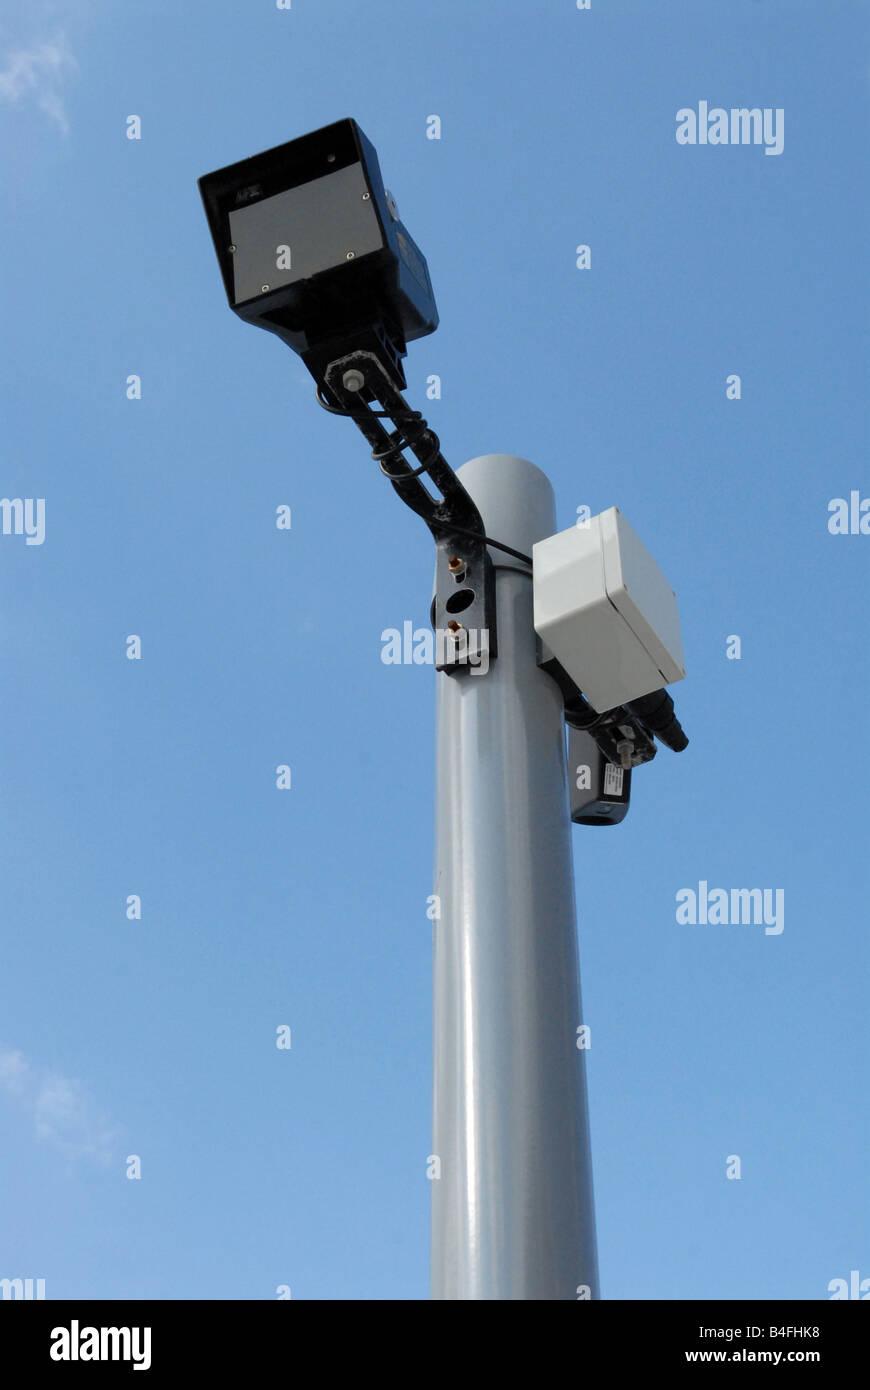 CCTV Closed Circuit Television Surveillance - Stock Image